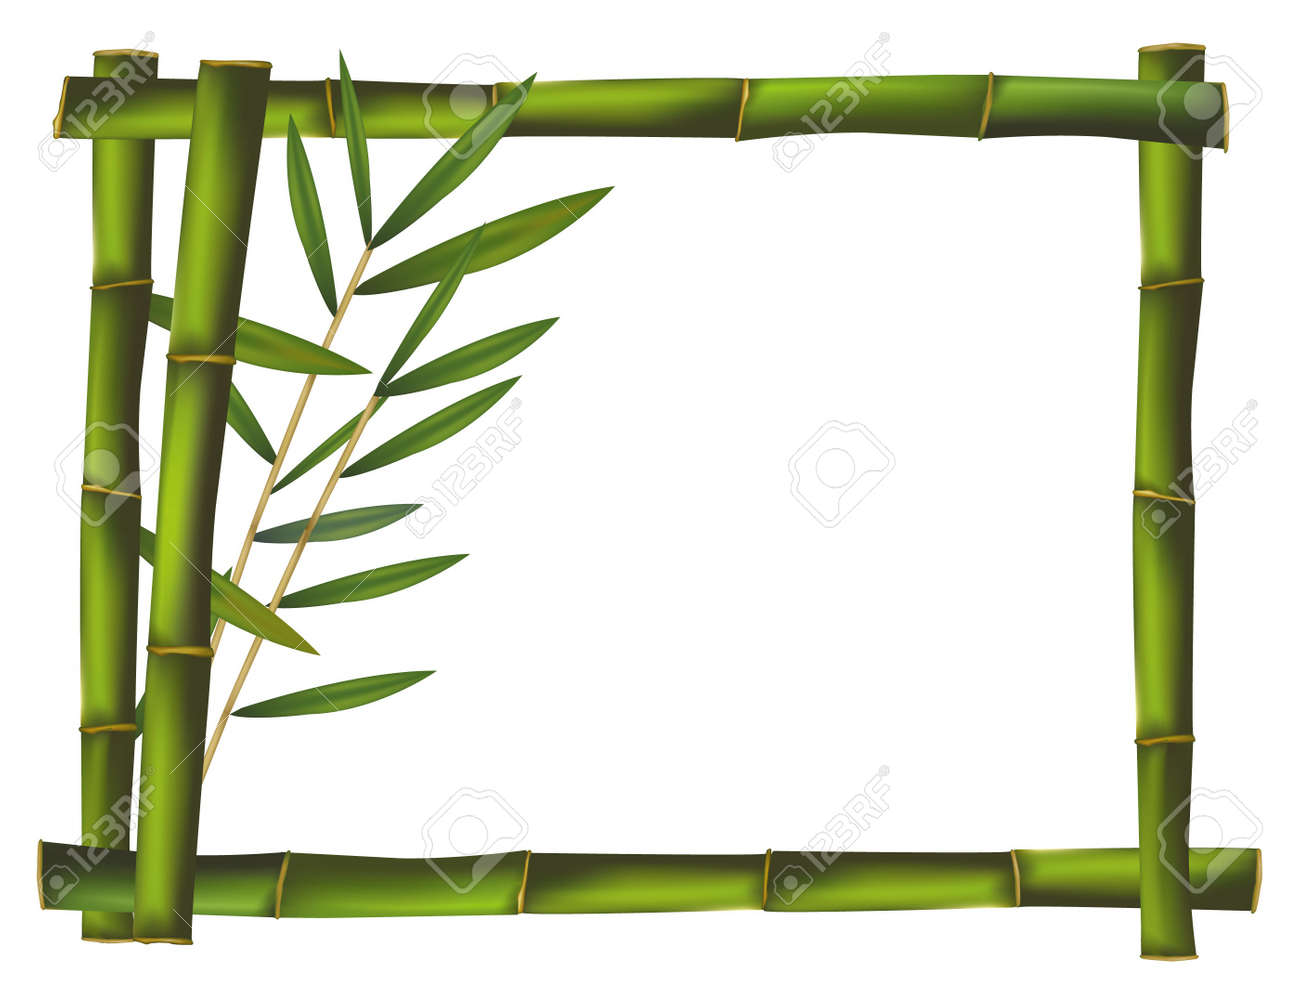 Grüner Bambus Rahmen Gebaut Rührt. Vektor. Lizenzfrei Nutzbare ...